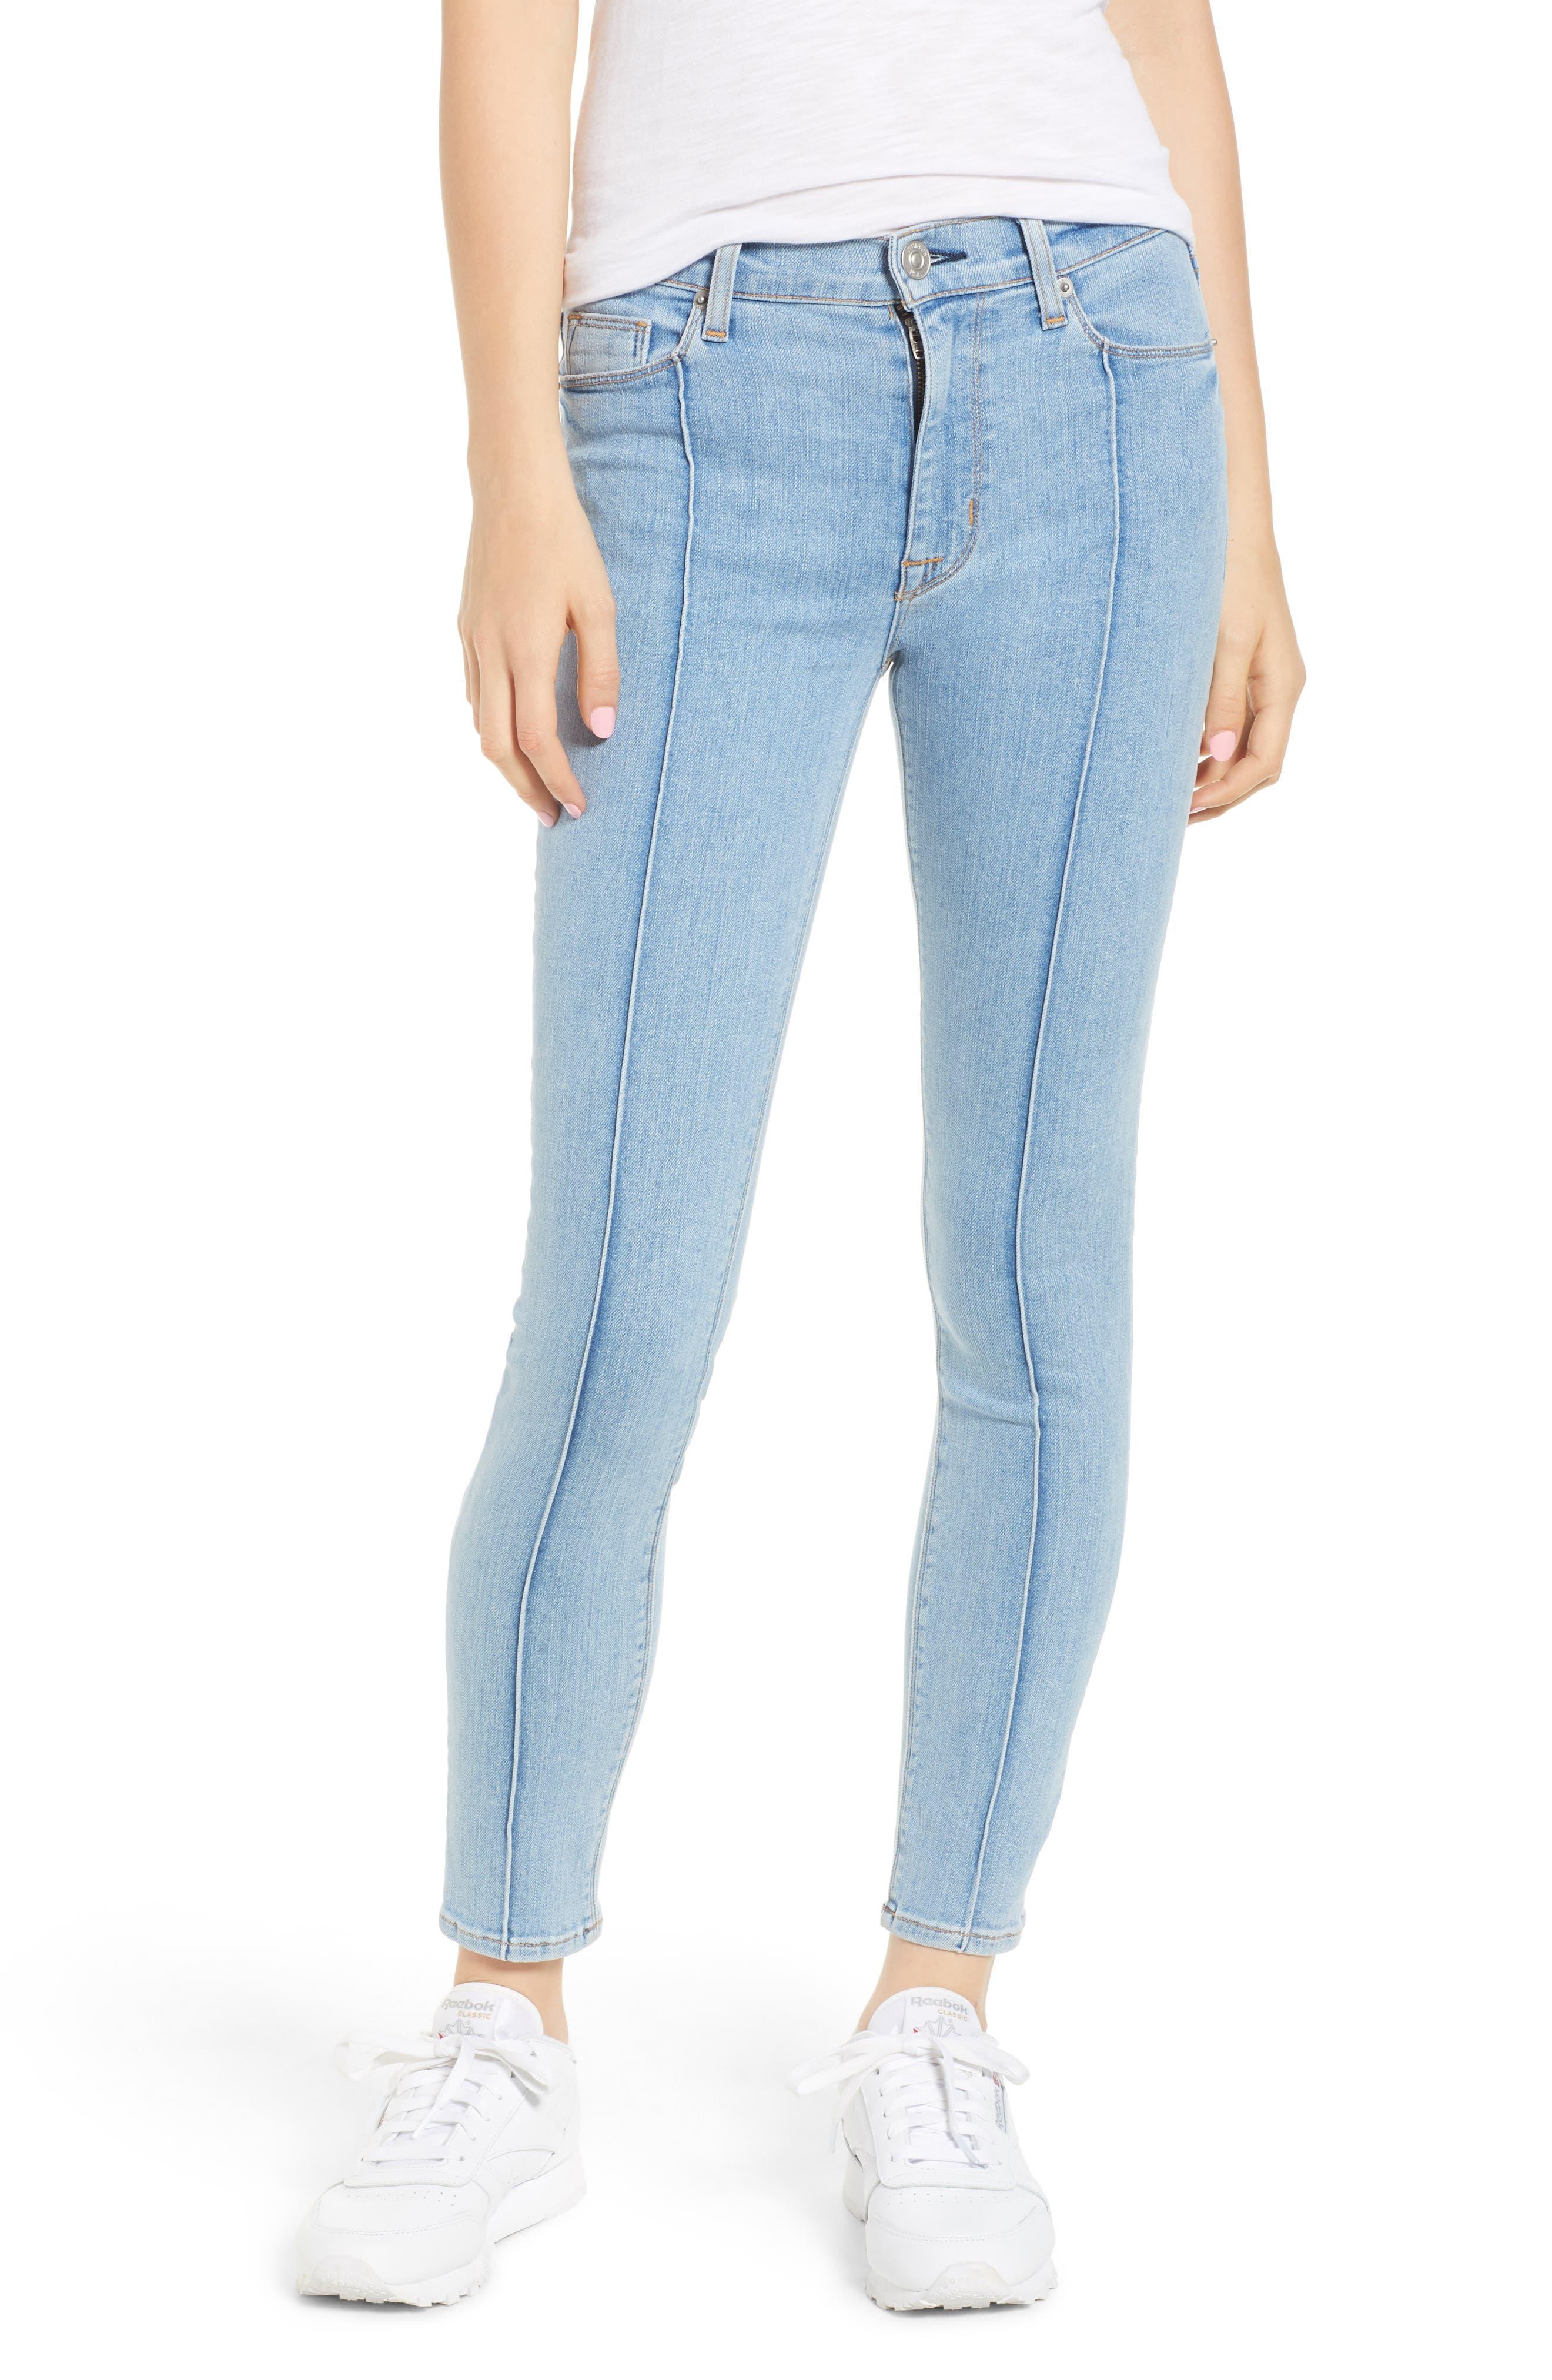 Barbara High Waist Super Skinny Jeans,                             Main thumbnail 1, color,                             450